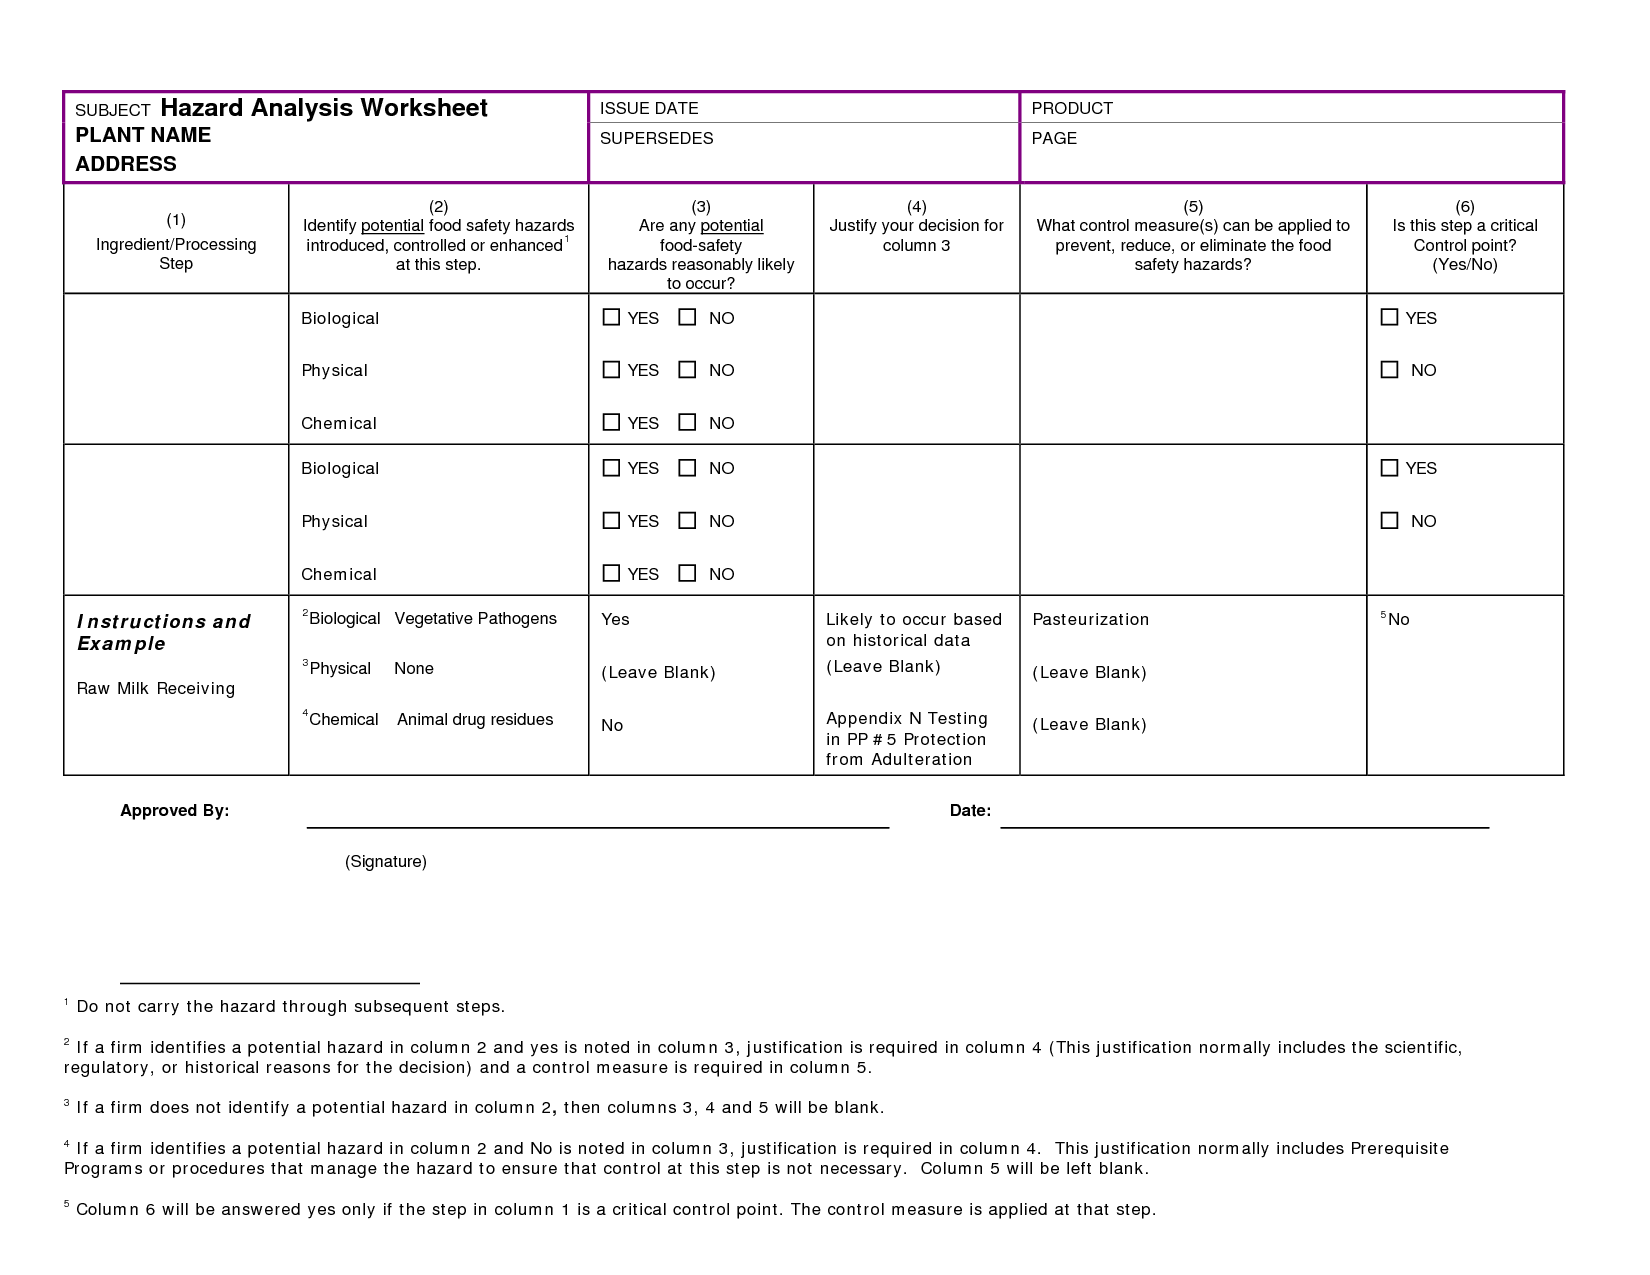 Hazardysis Worksheet Examples